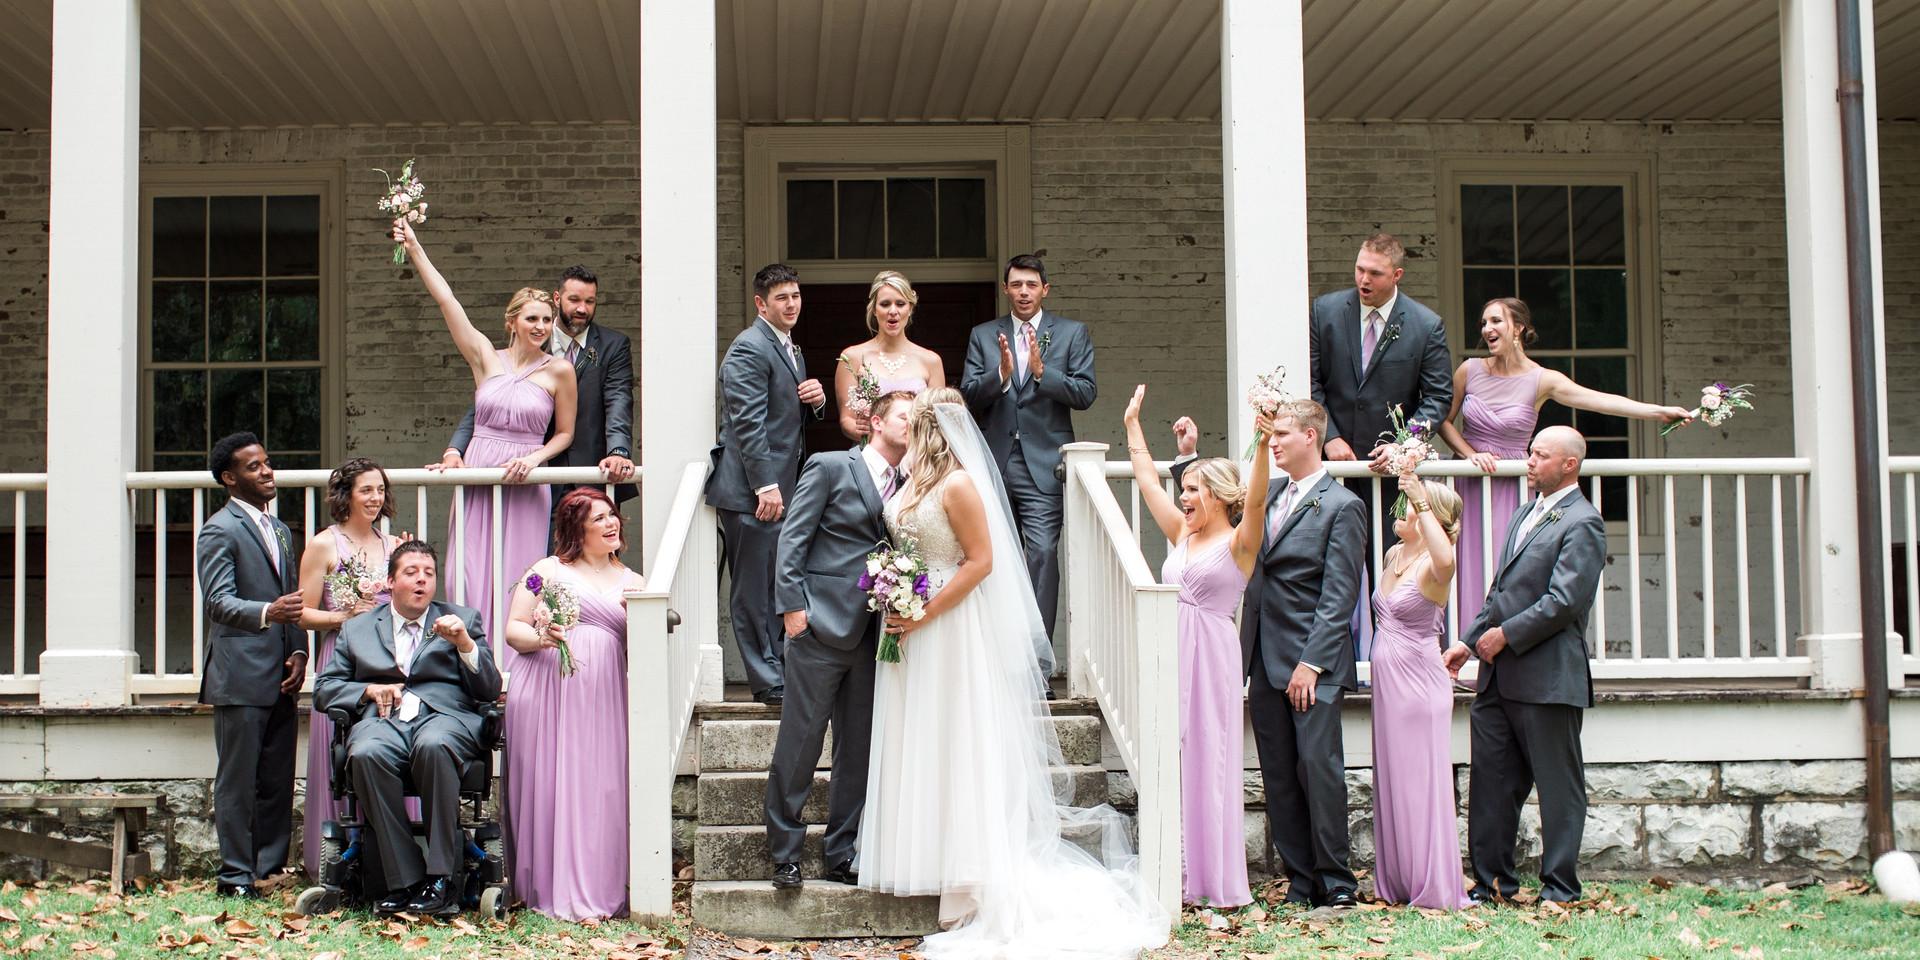 Copy of 6.Brooke+AustinPOST-WEDDINGPORTR